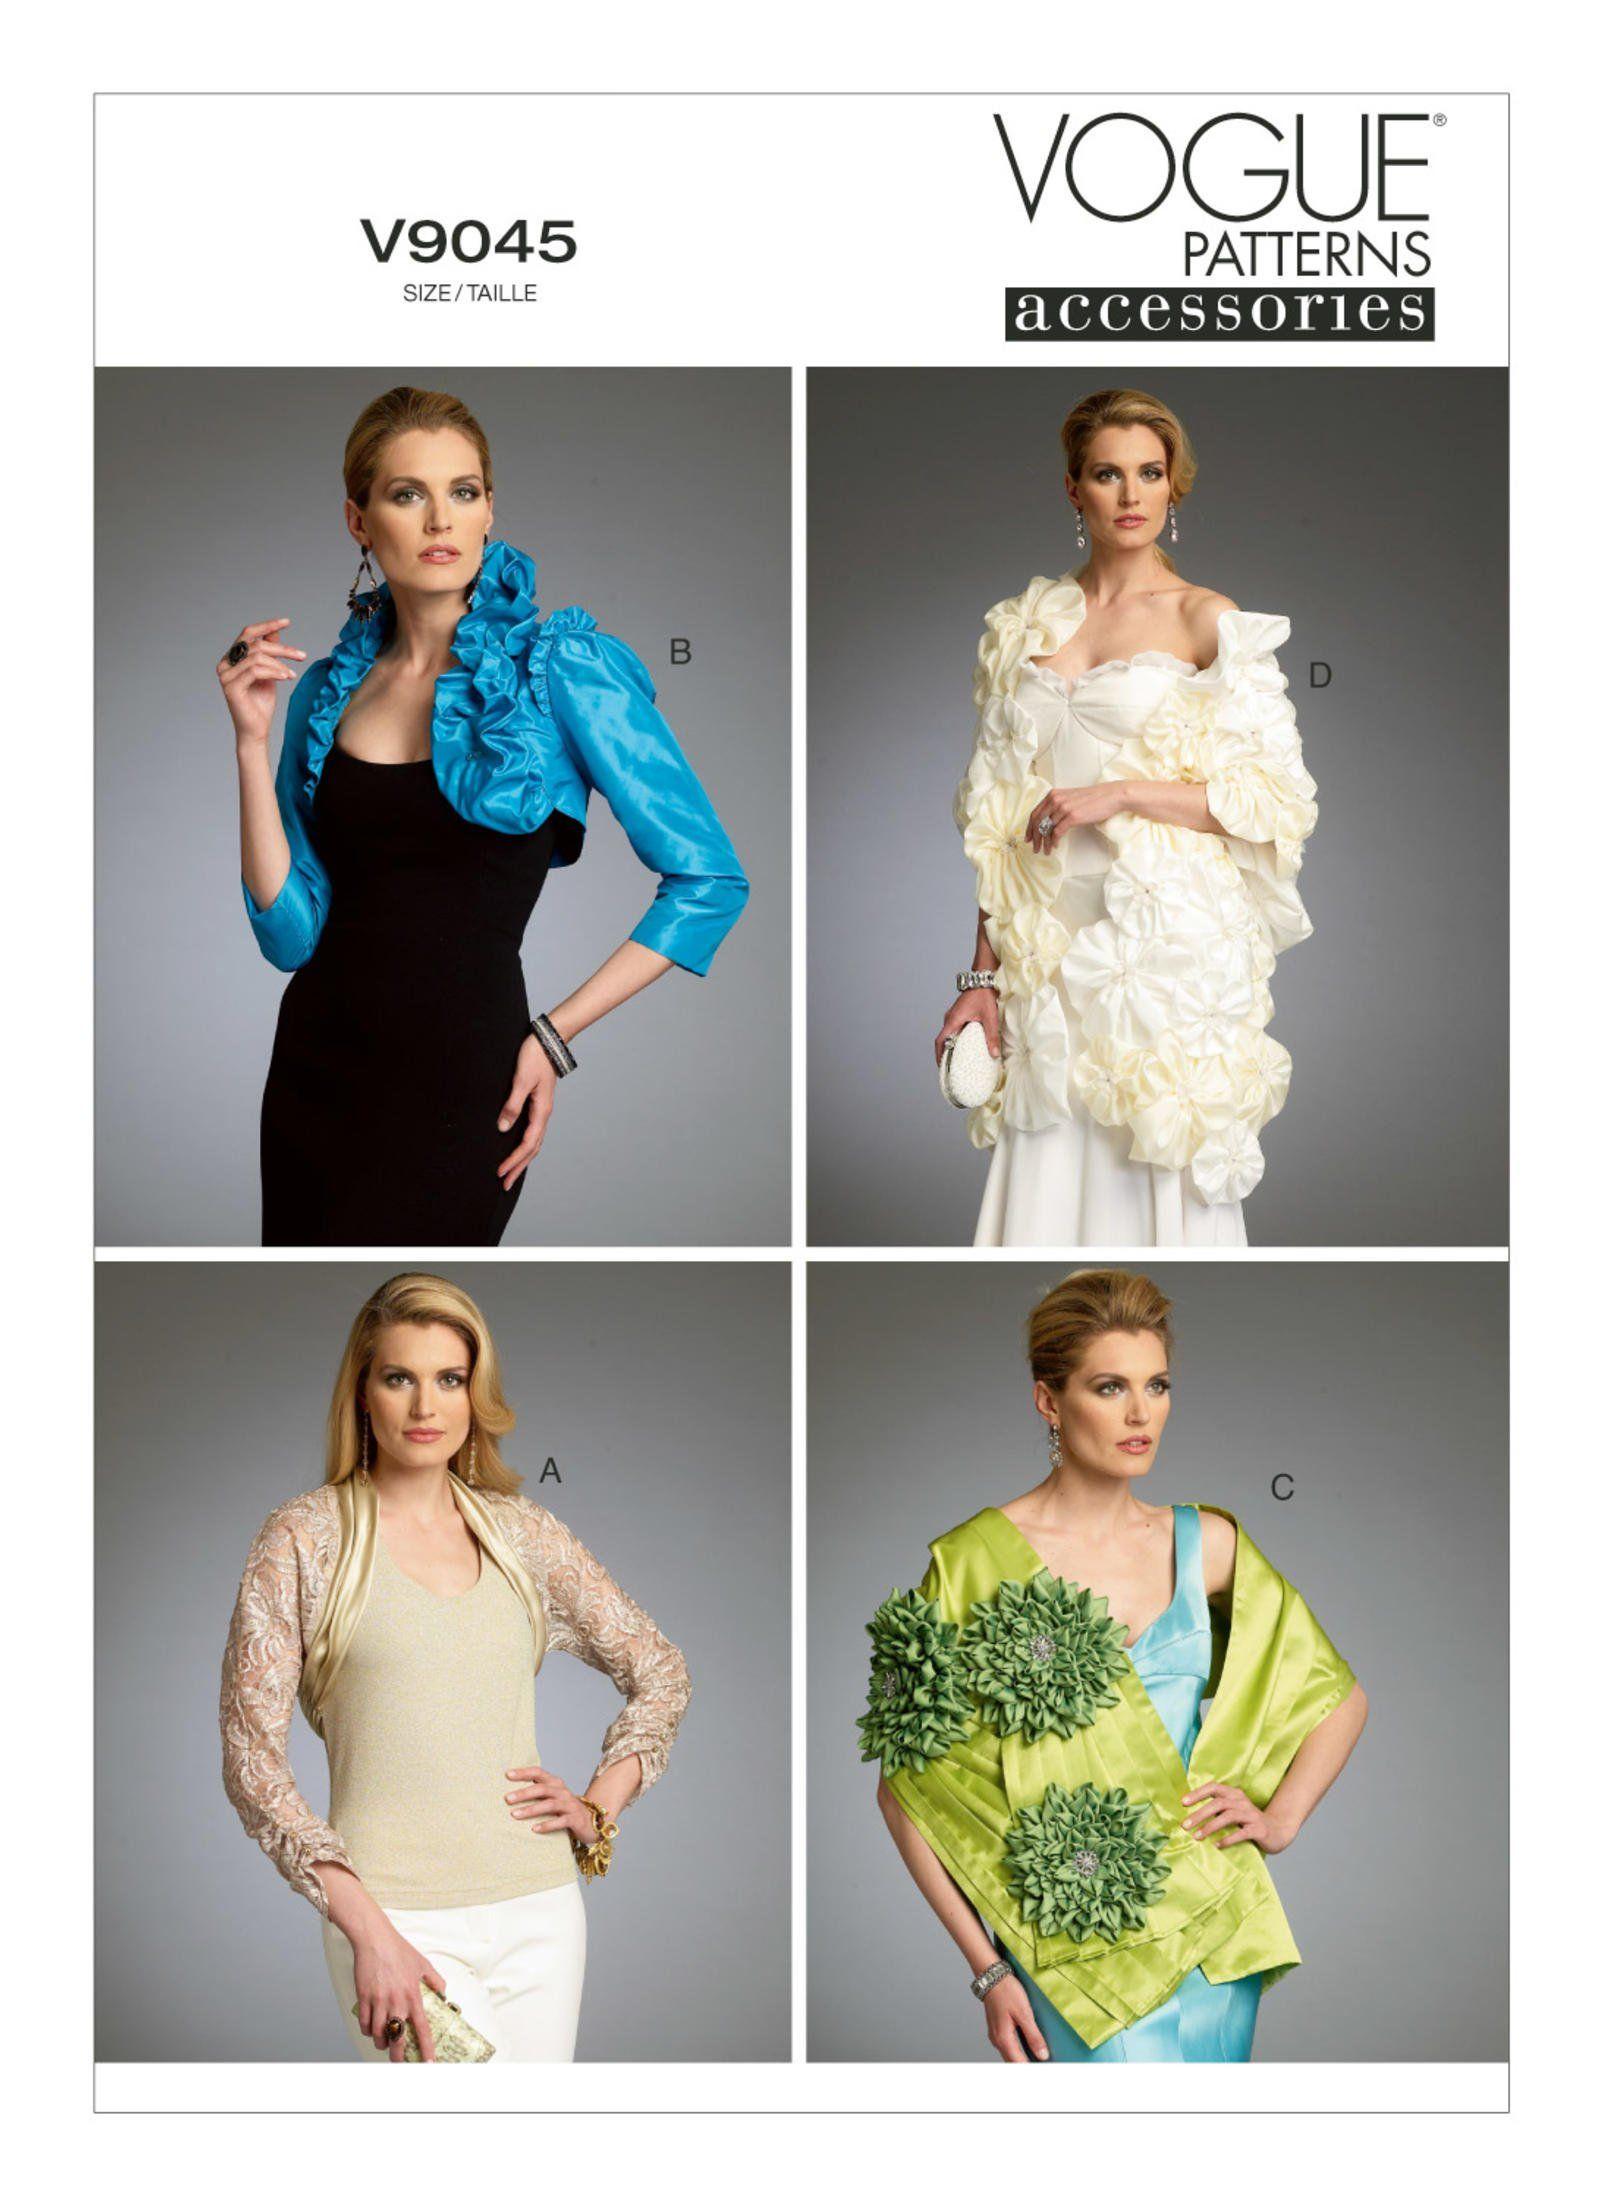 Sz Xsm Sml Med Vogue Accessories Pattern V9045 Misses